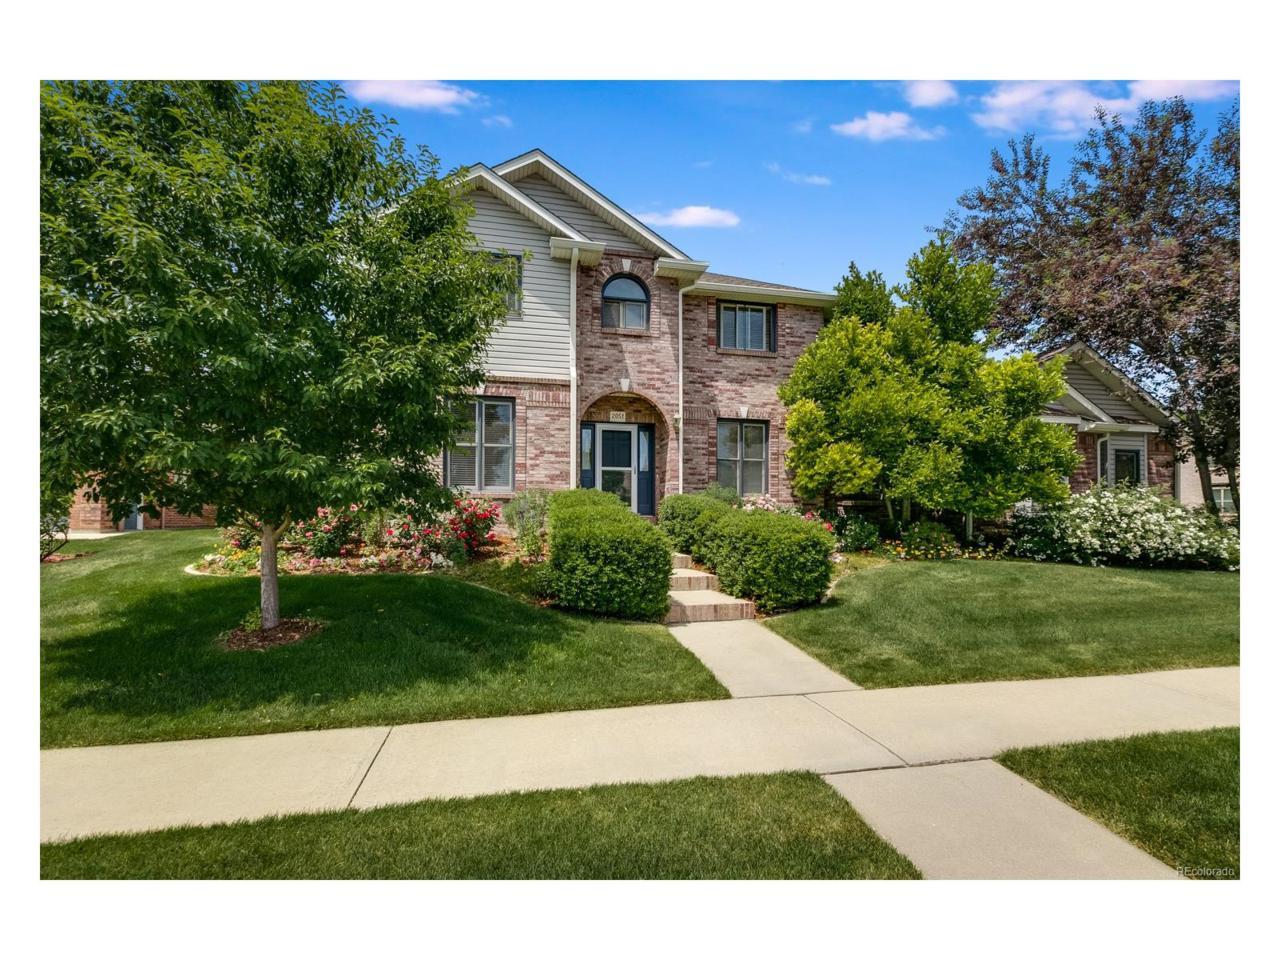 2051 Emerald Drive, Longmont, CO 80504 (MLS #1849704) :: 8z Real Estate